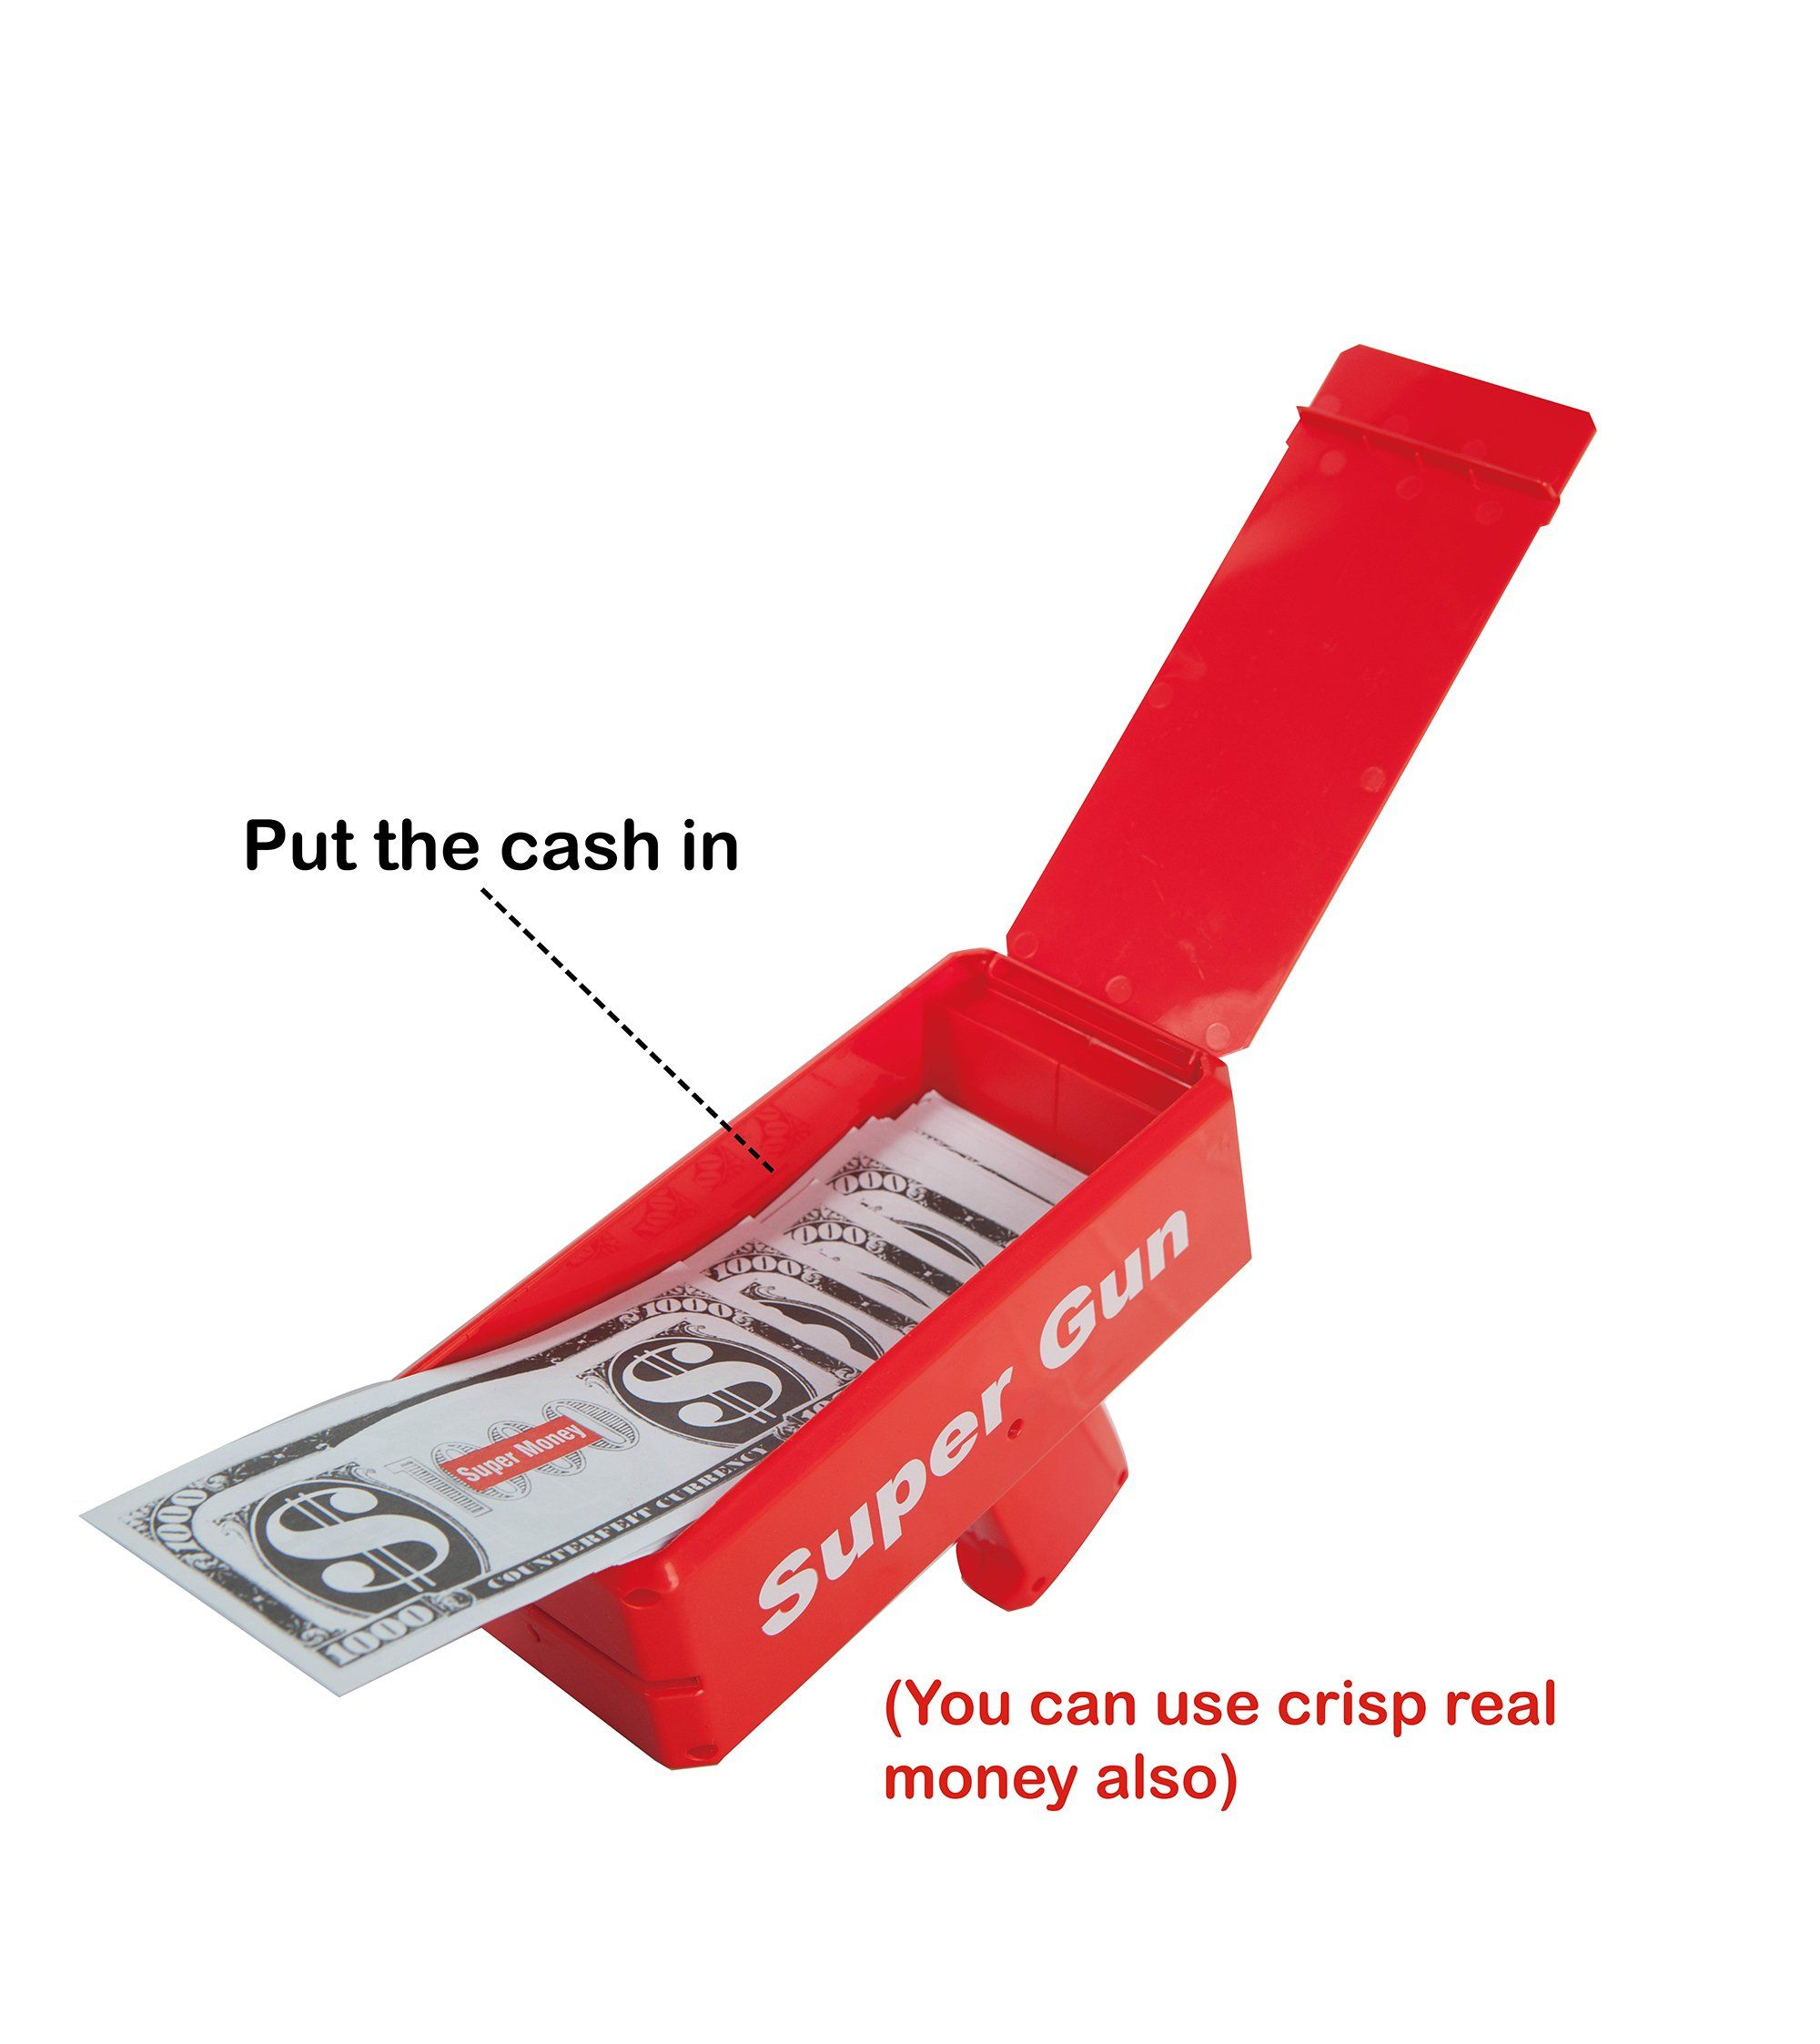 Money Gun Rain Cash Party Make It Fake Machine Launch Toy Gift Game Ca Red